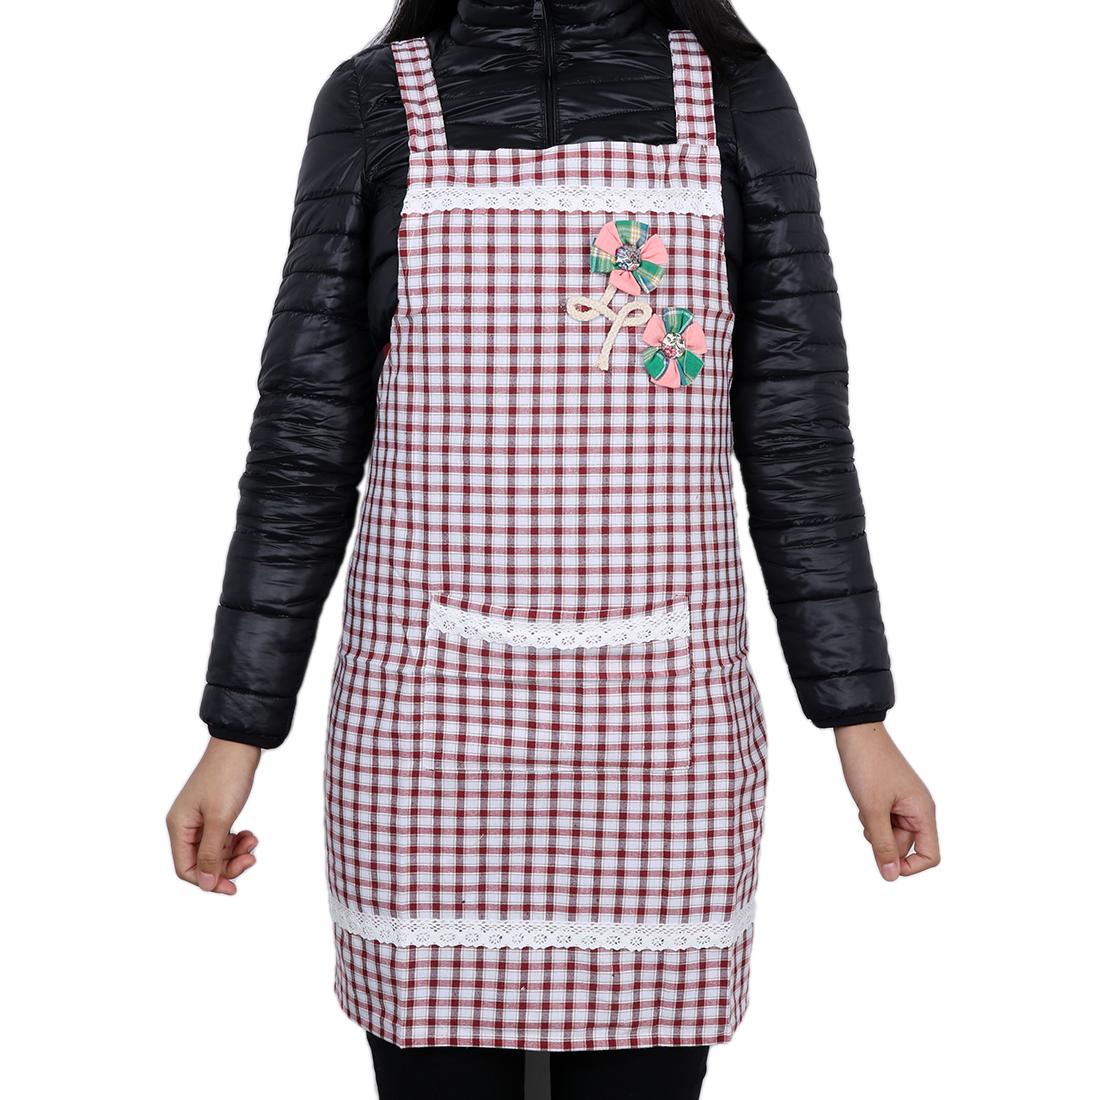 Grid Chefs Kitchen Bib Cooking Apron for Lady Purplish Red